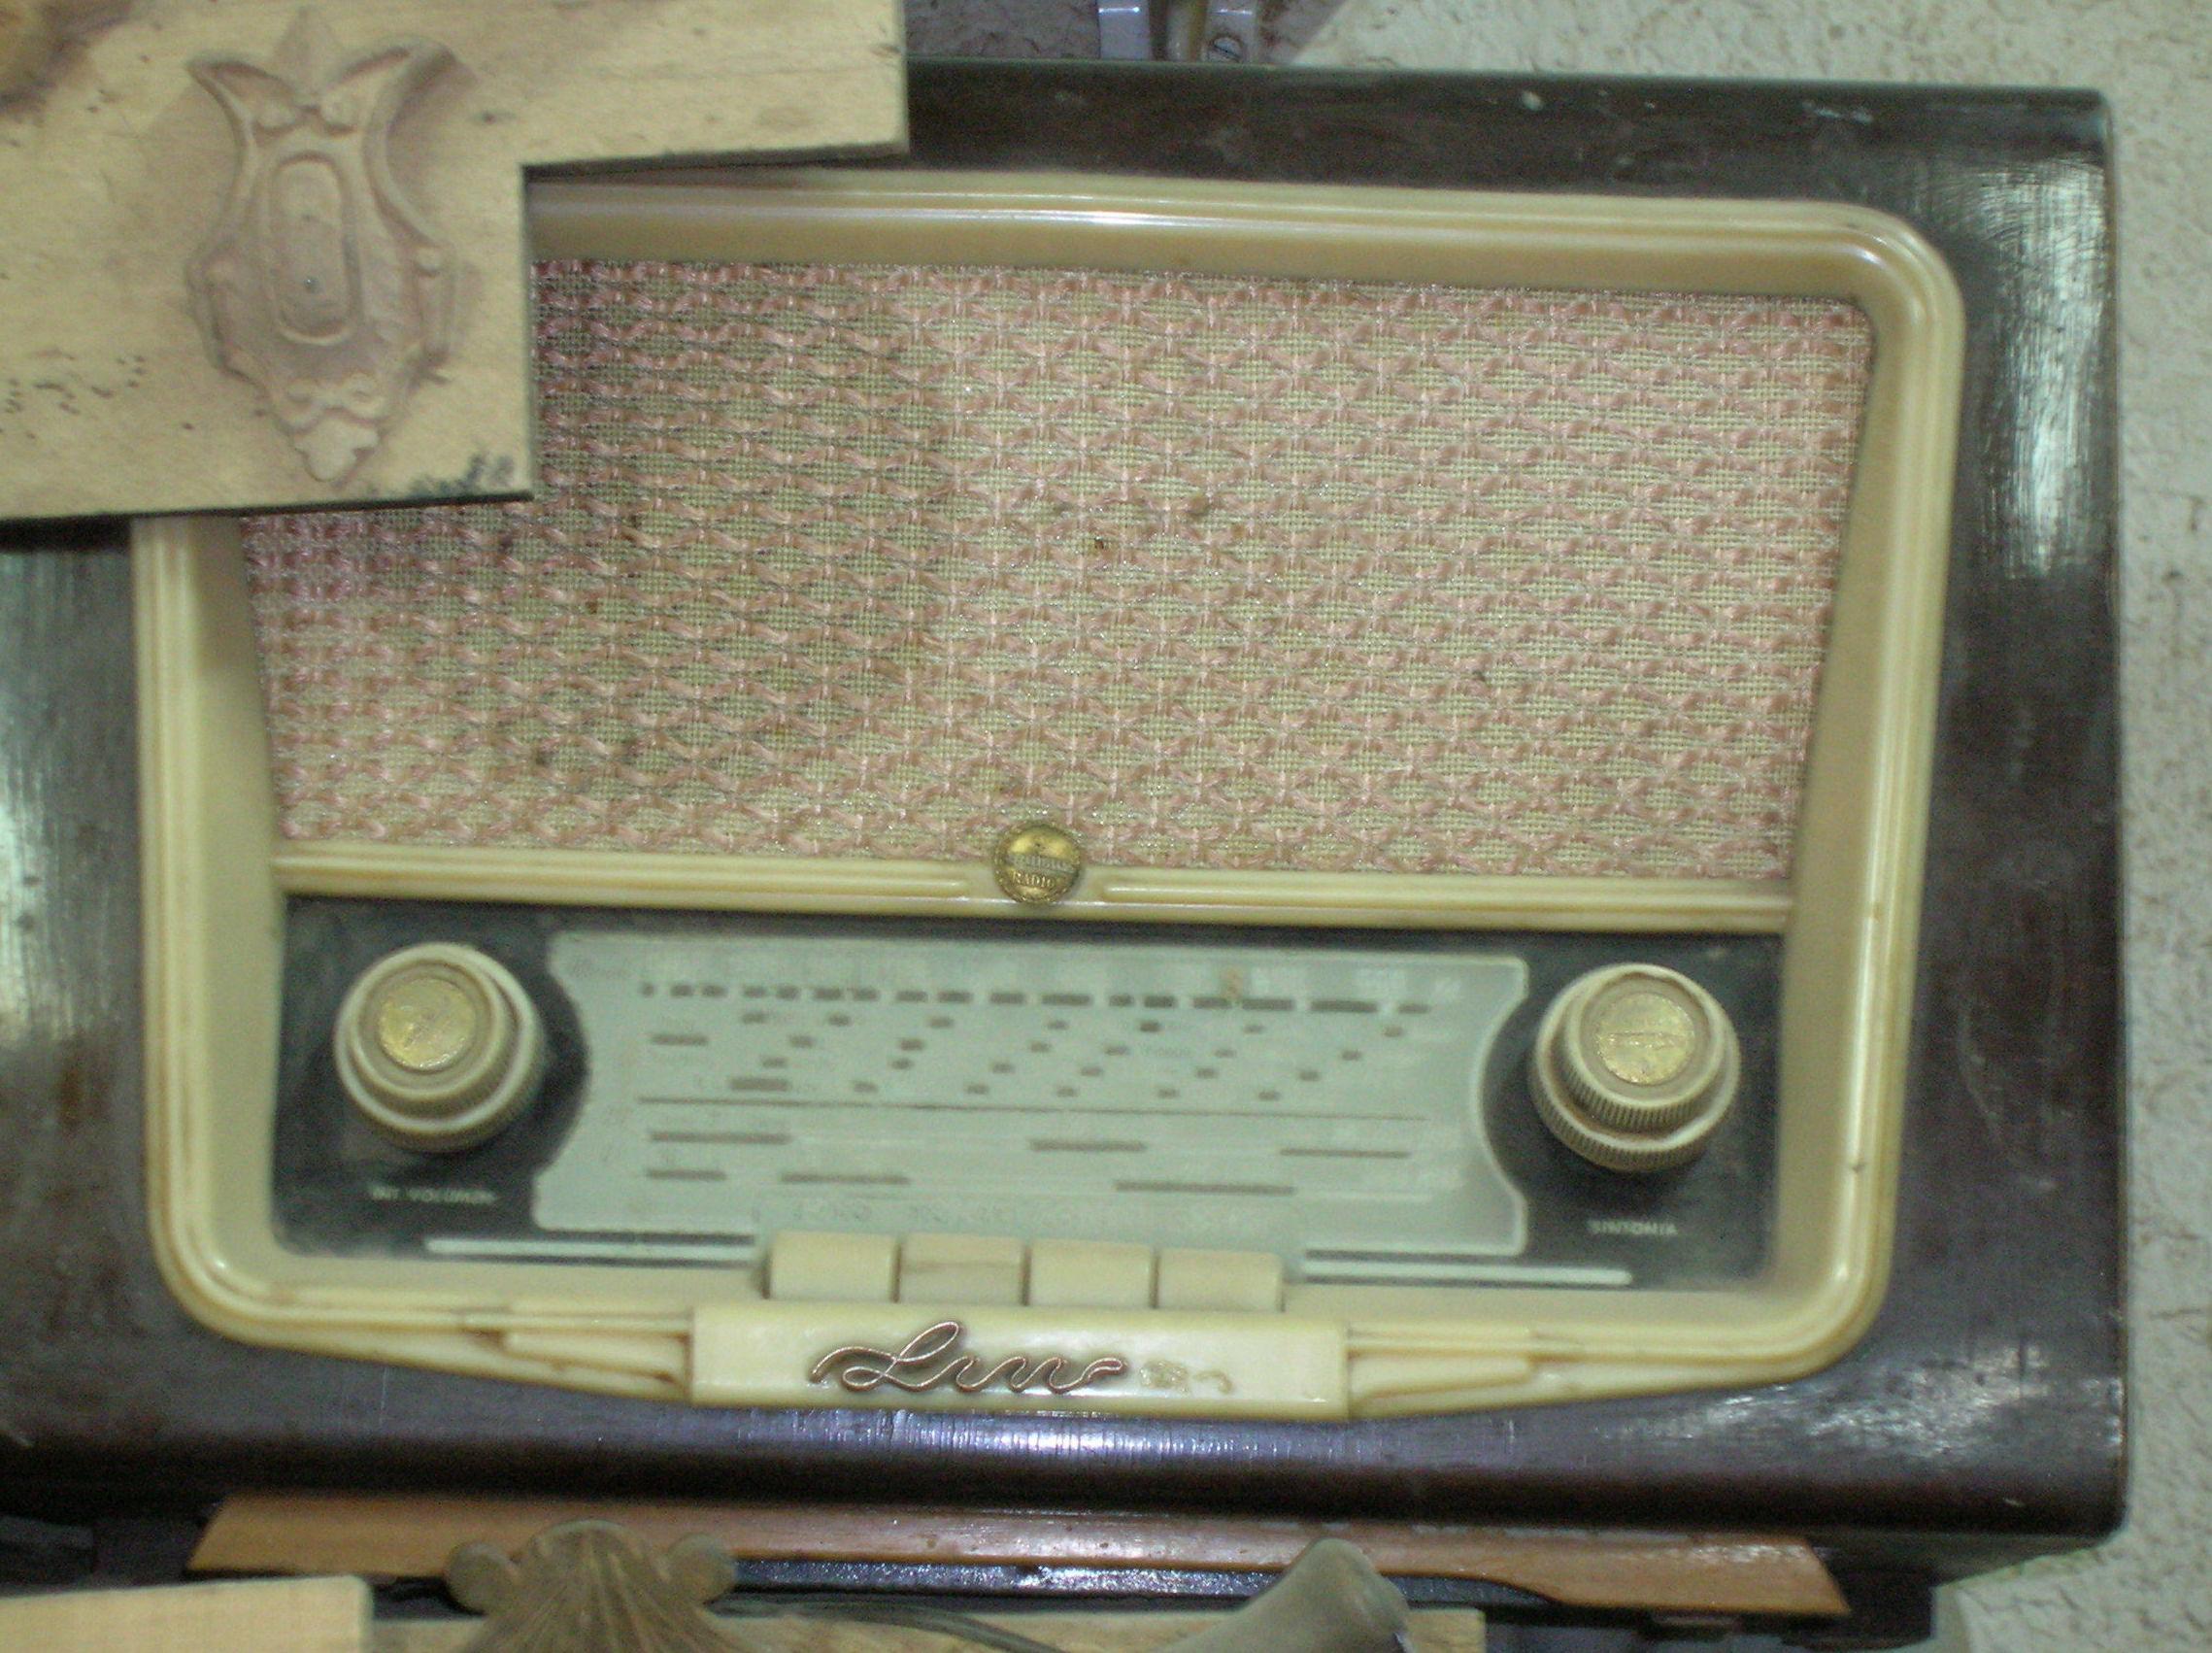 restauracion de transistor